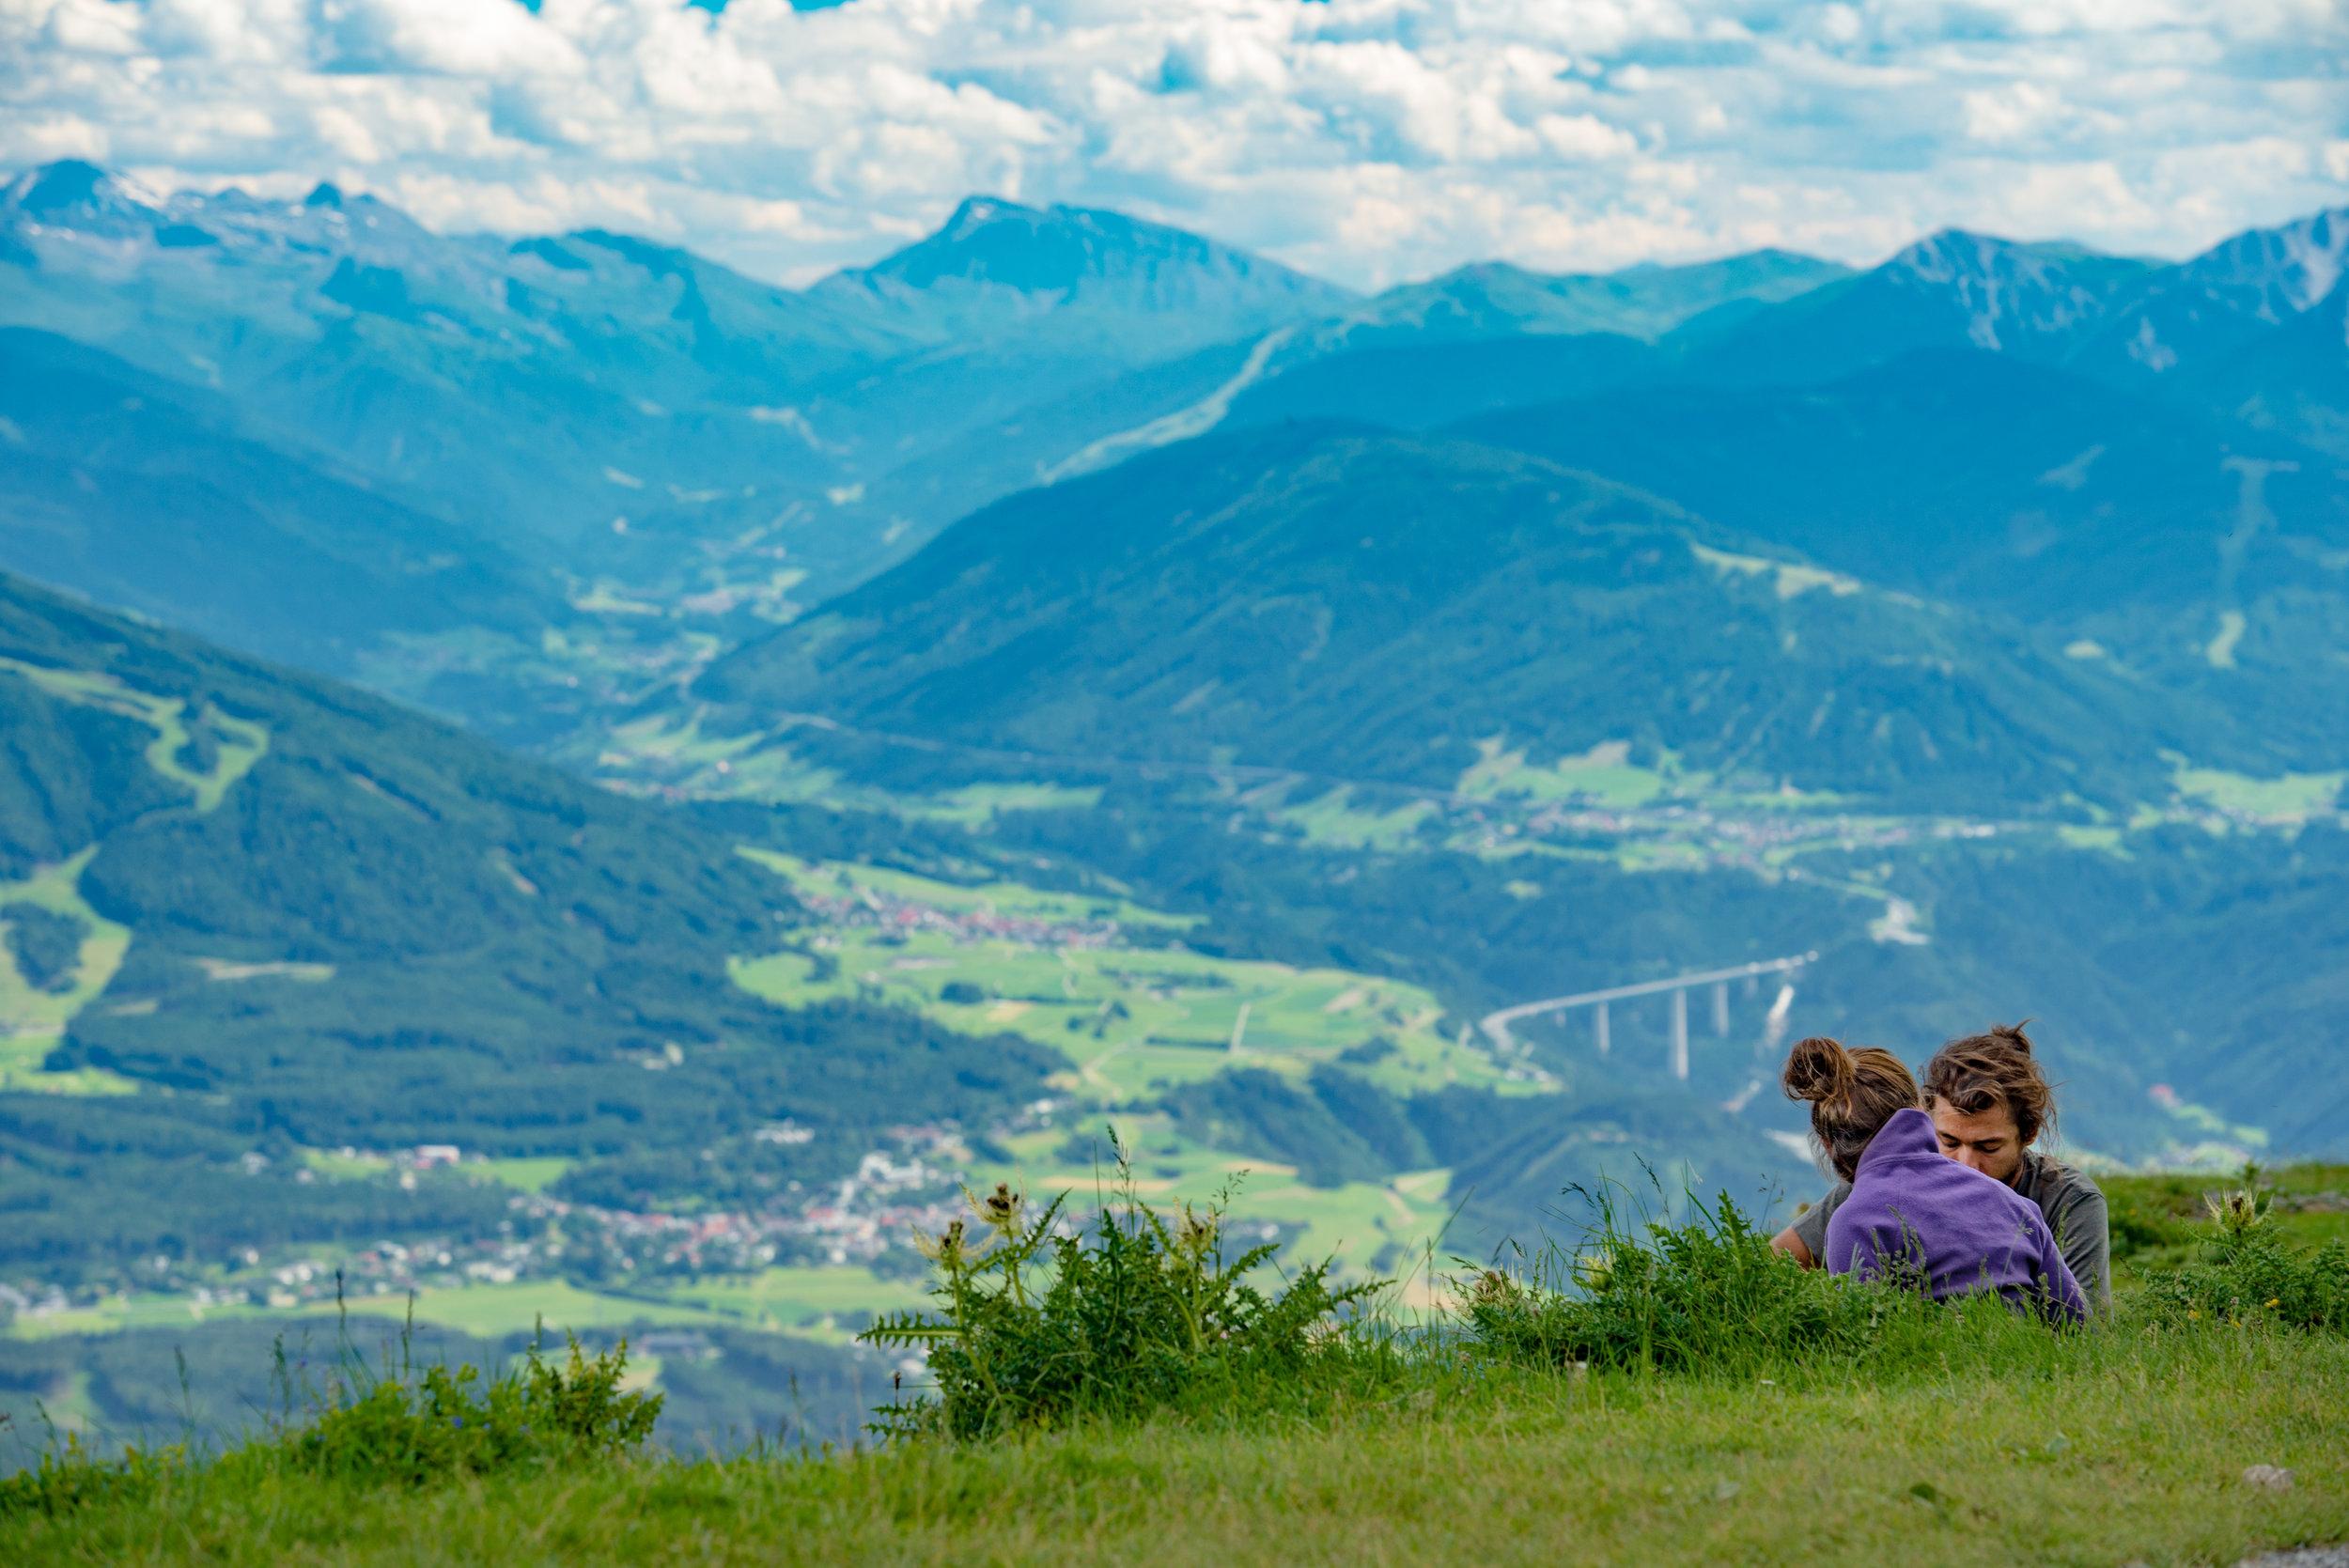 Nordkette in Innsbruck, Austria